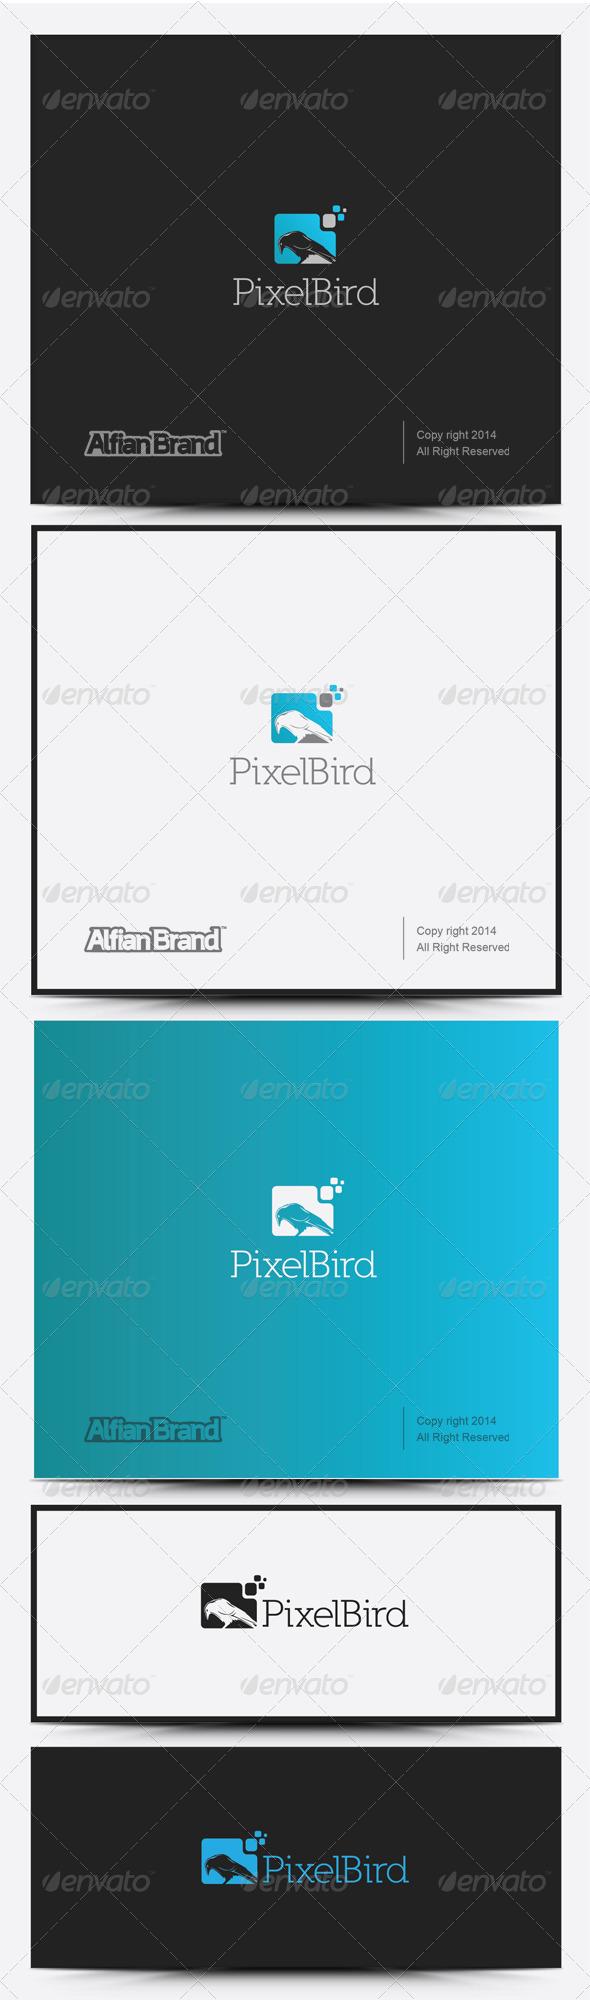 GraphicRiver Pixel Bird Logo 8317858